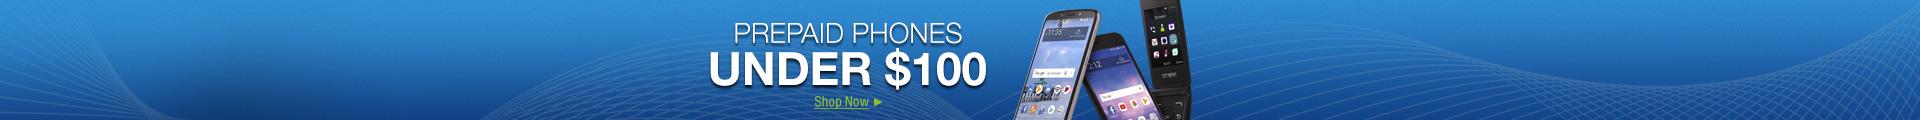 Prepaid Phones under $100